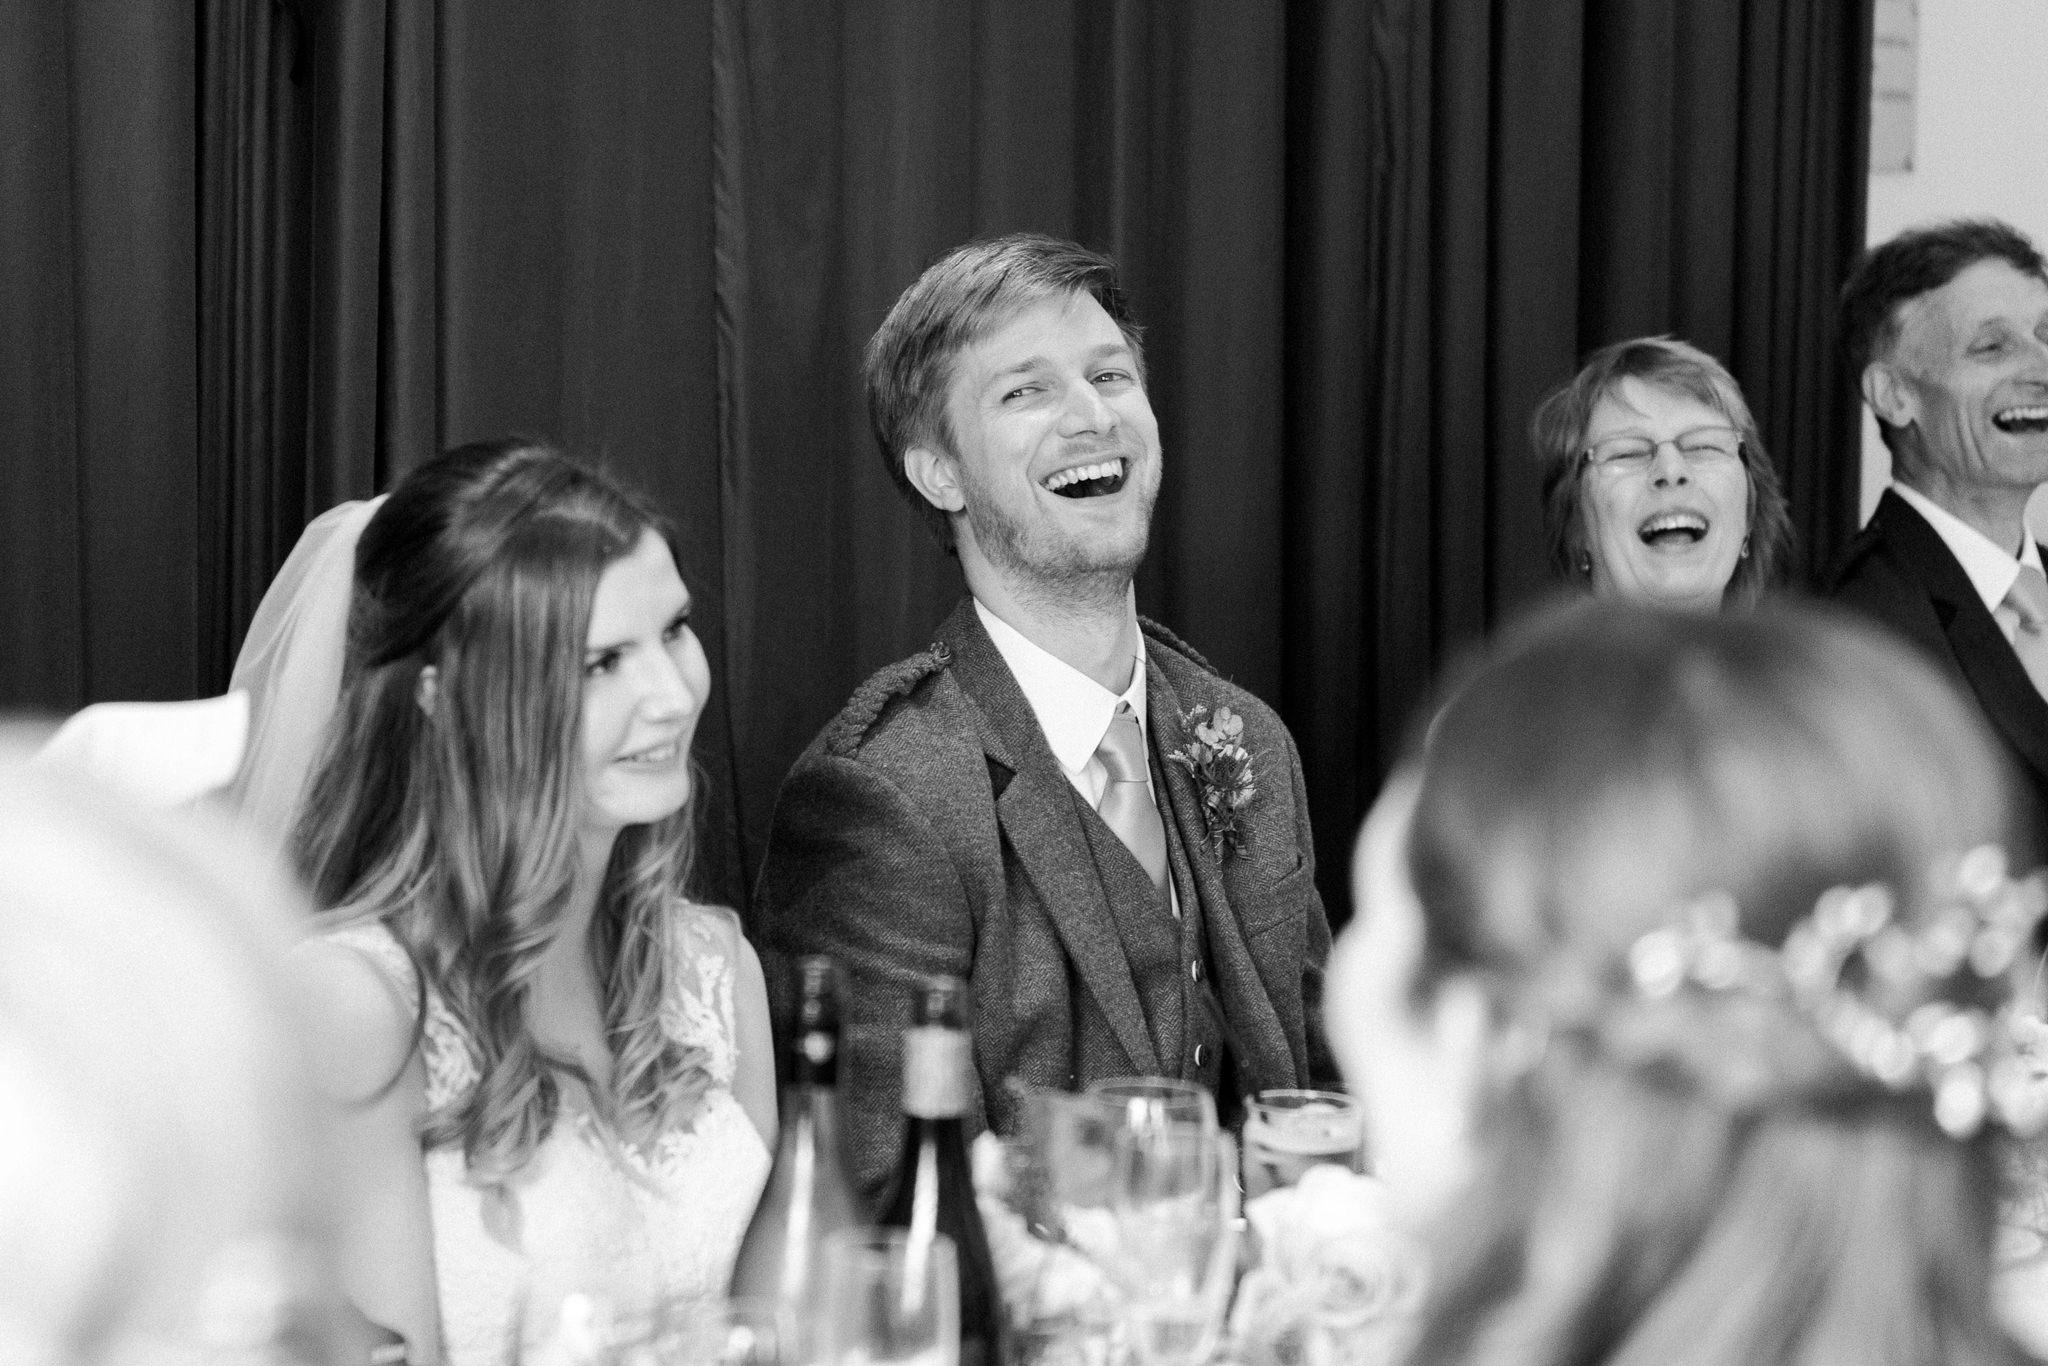 101-natural-wedding-photography.jpg